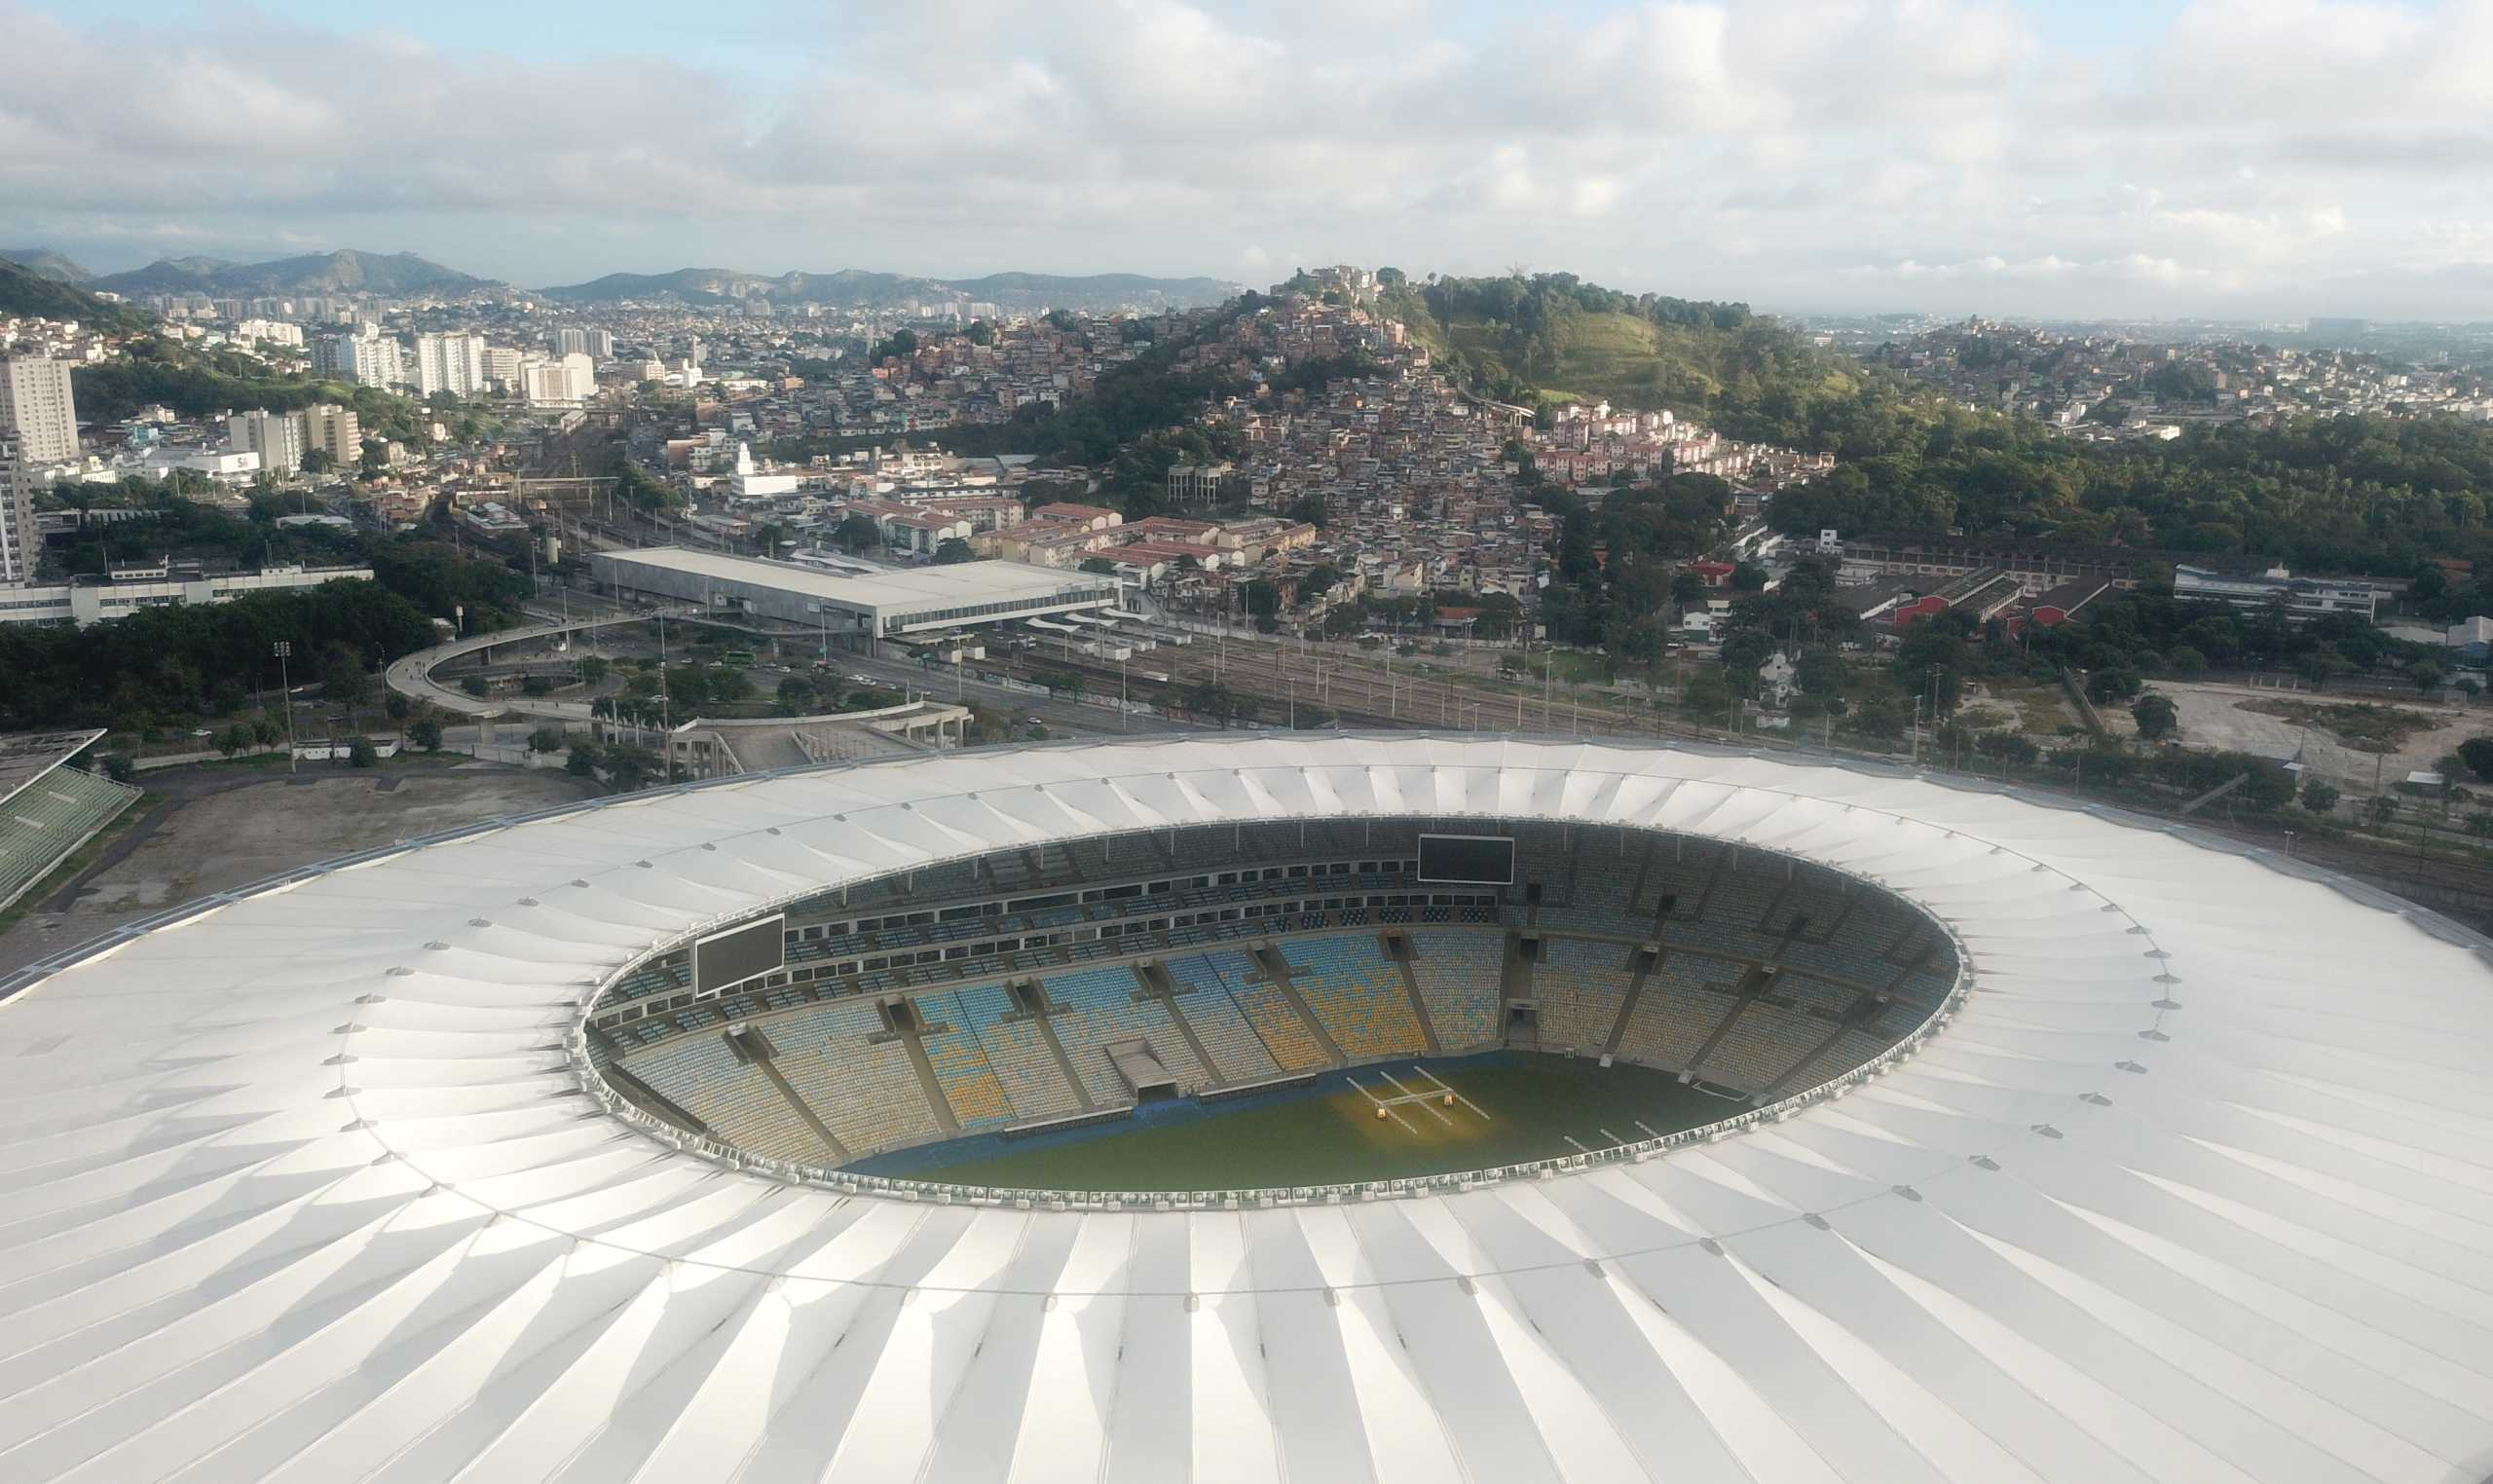 Copa America: Απίστευτη απόφαση για χιλιάδες οπαδούς στον τελικό